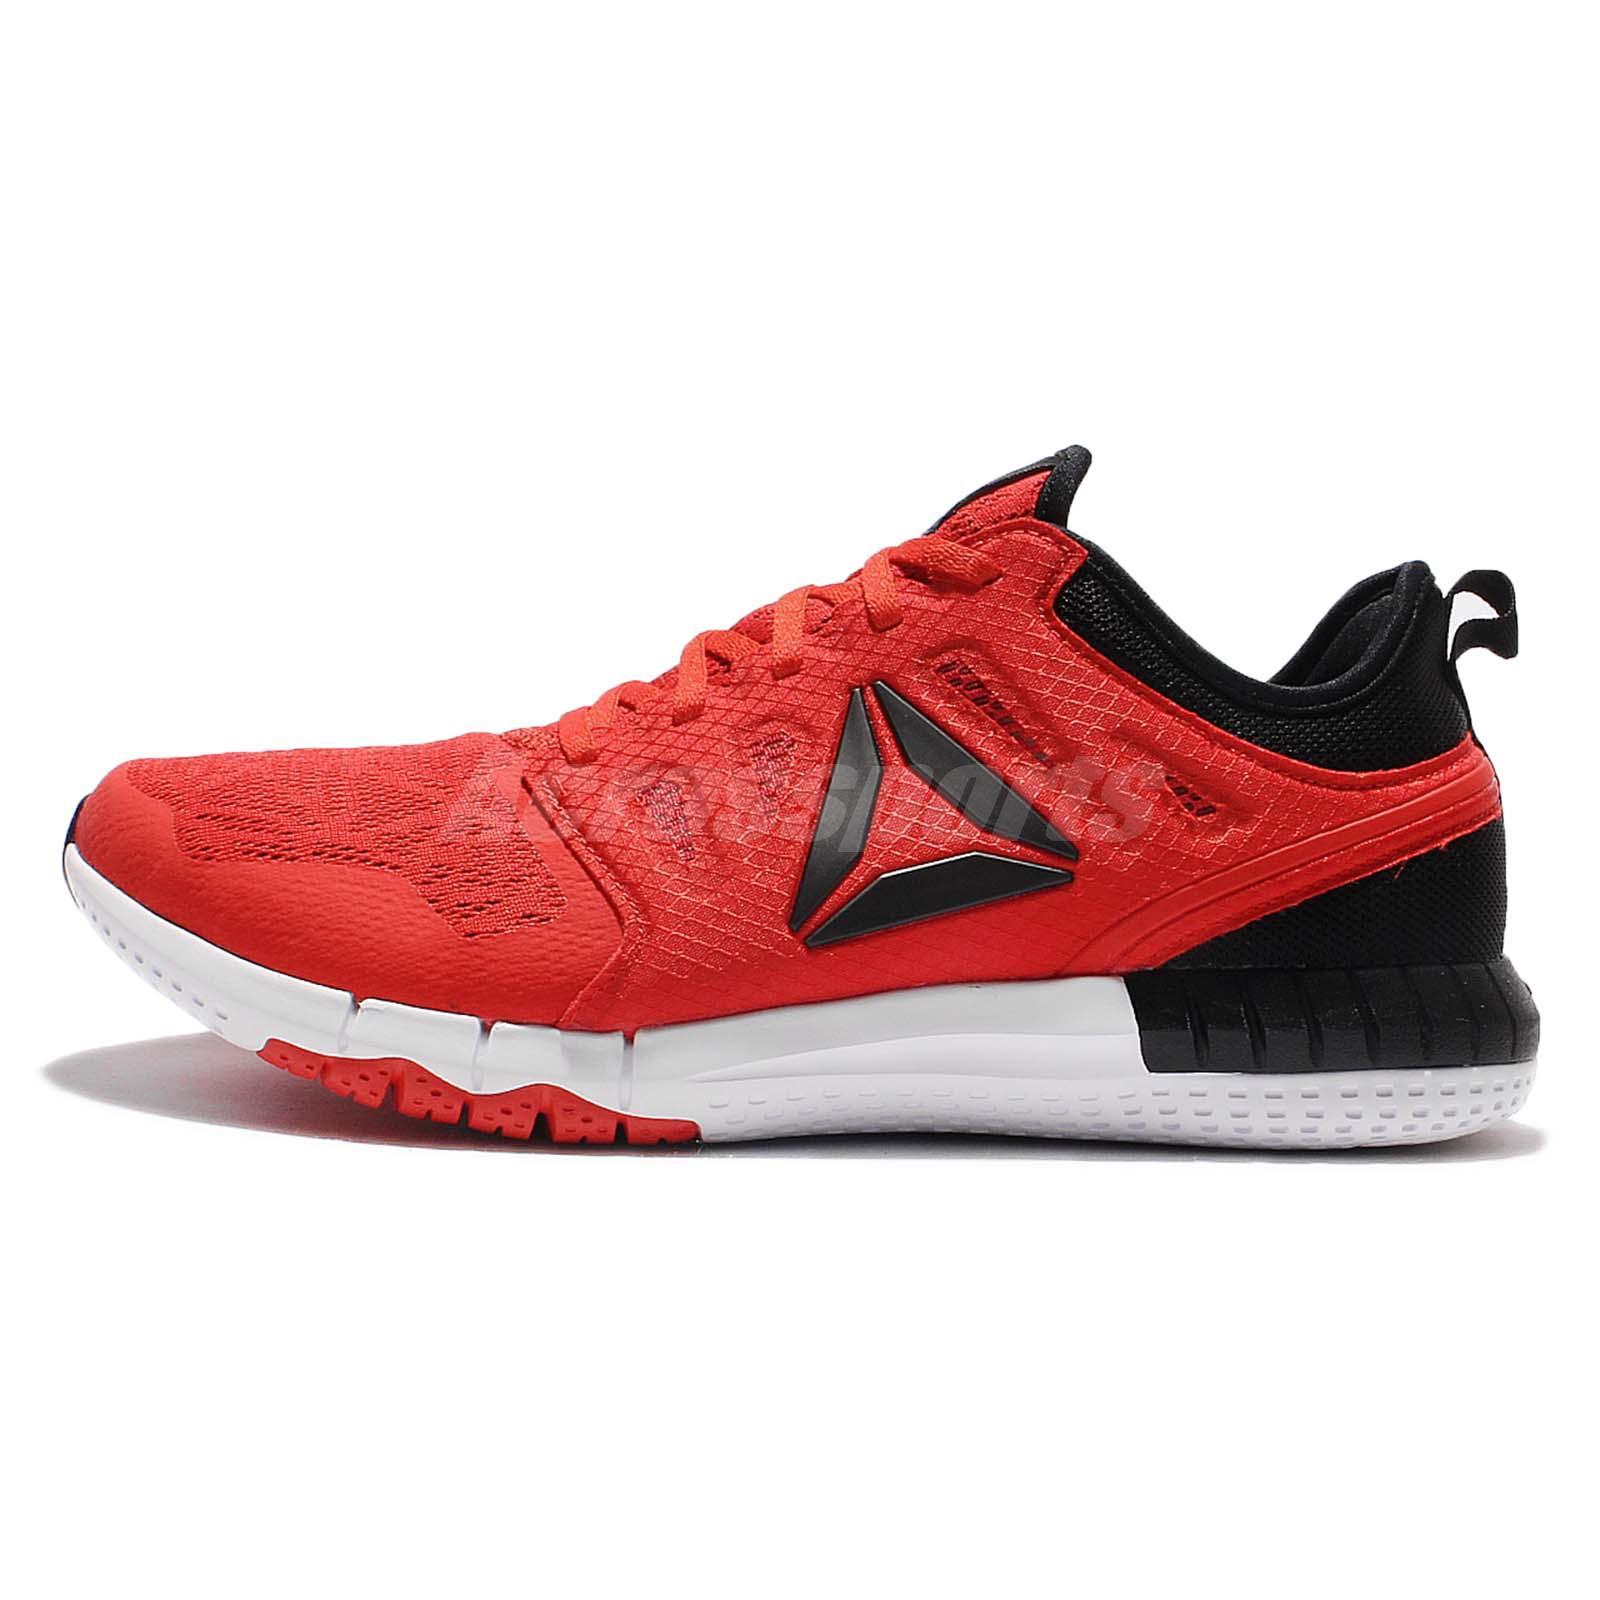 Reebok ZPrint 3D EX Red Black Mens Running Shoes Sneakers Trianers AR2868